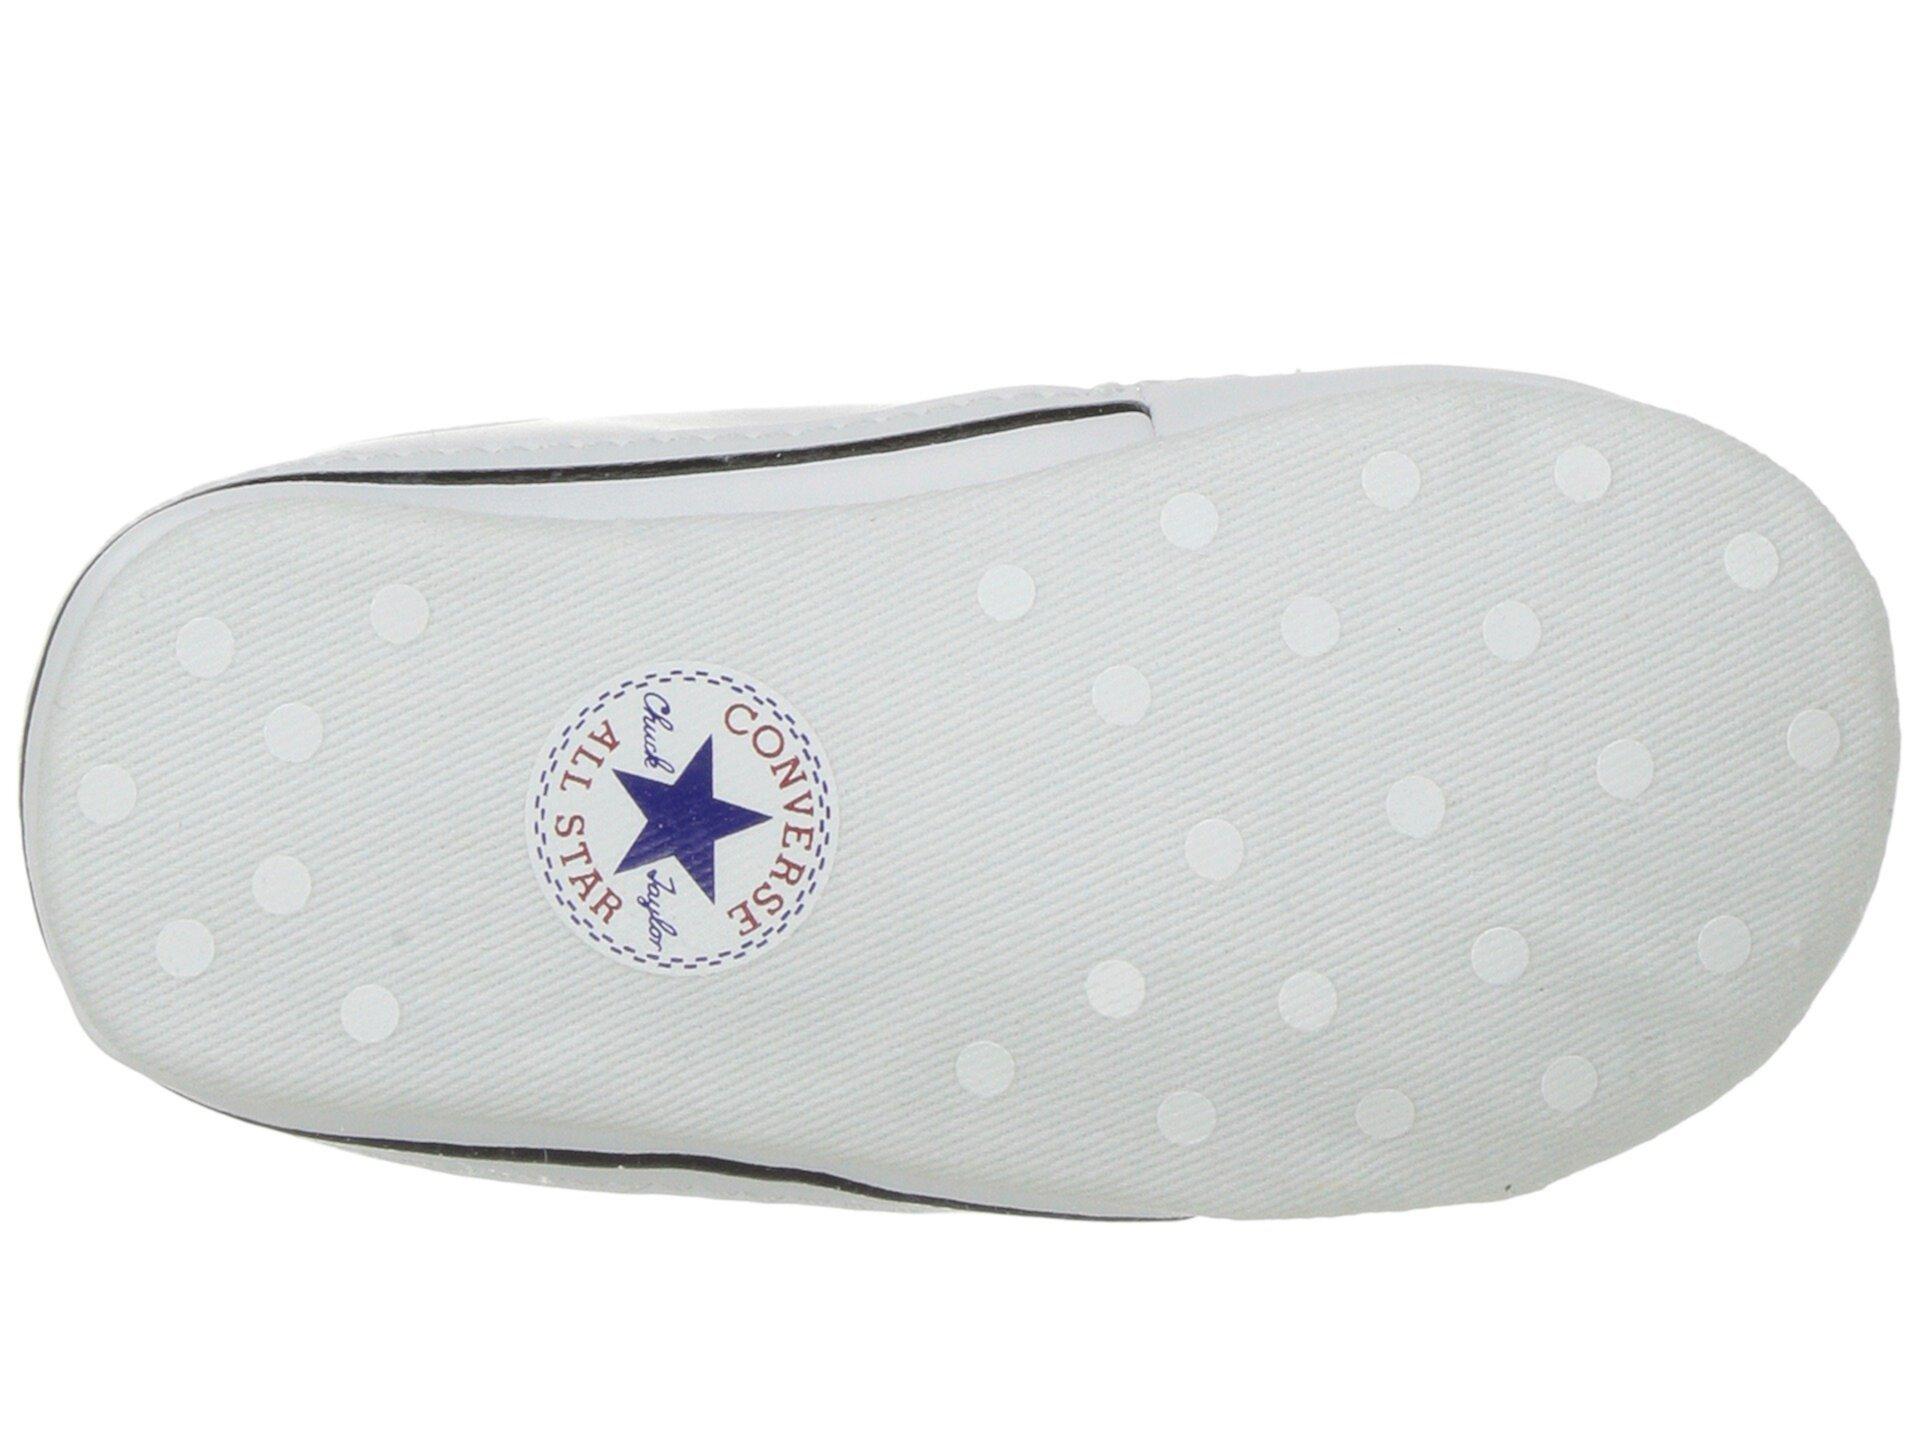 Детская кроватка Chuck Taylor® First Star (Младенец / Малыш) Converse Kids